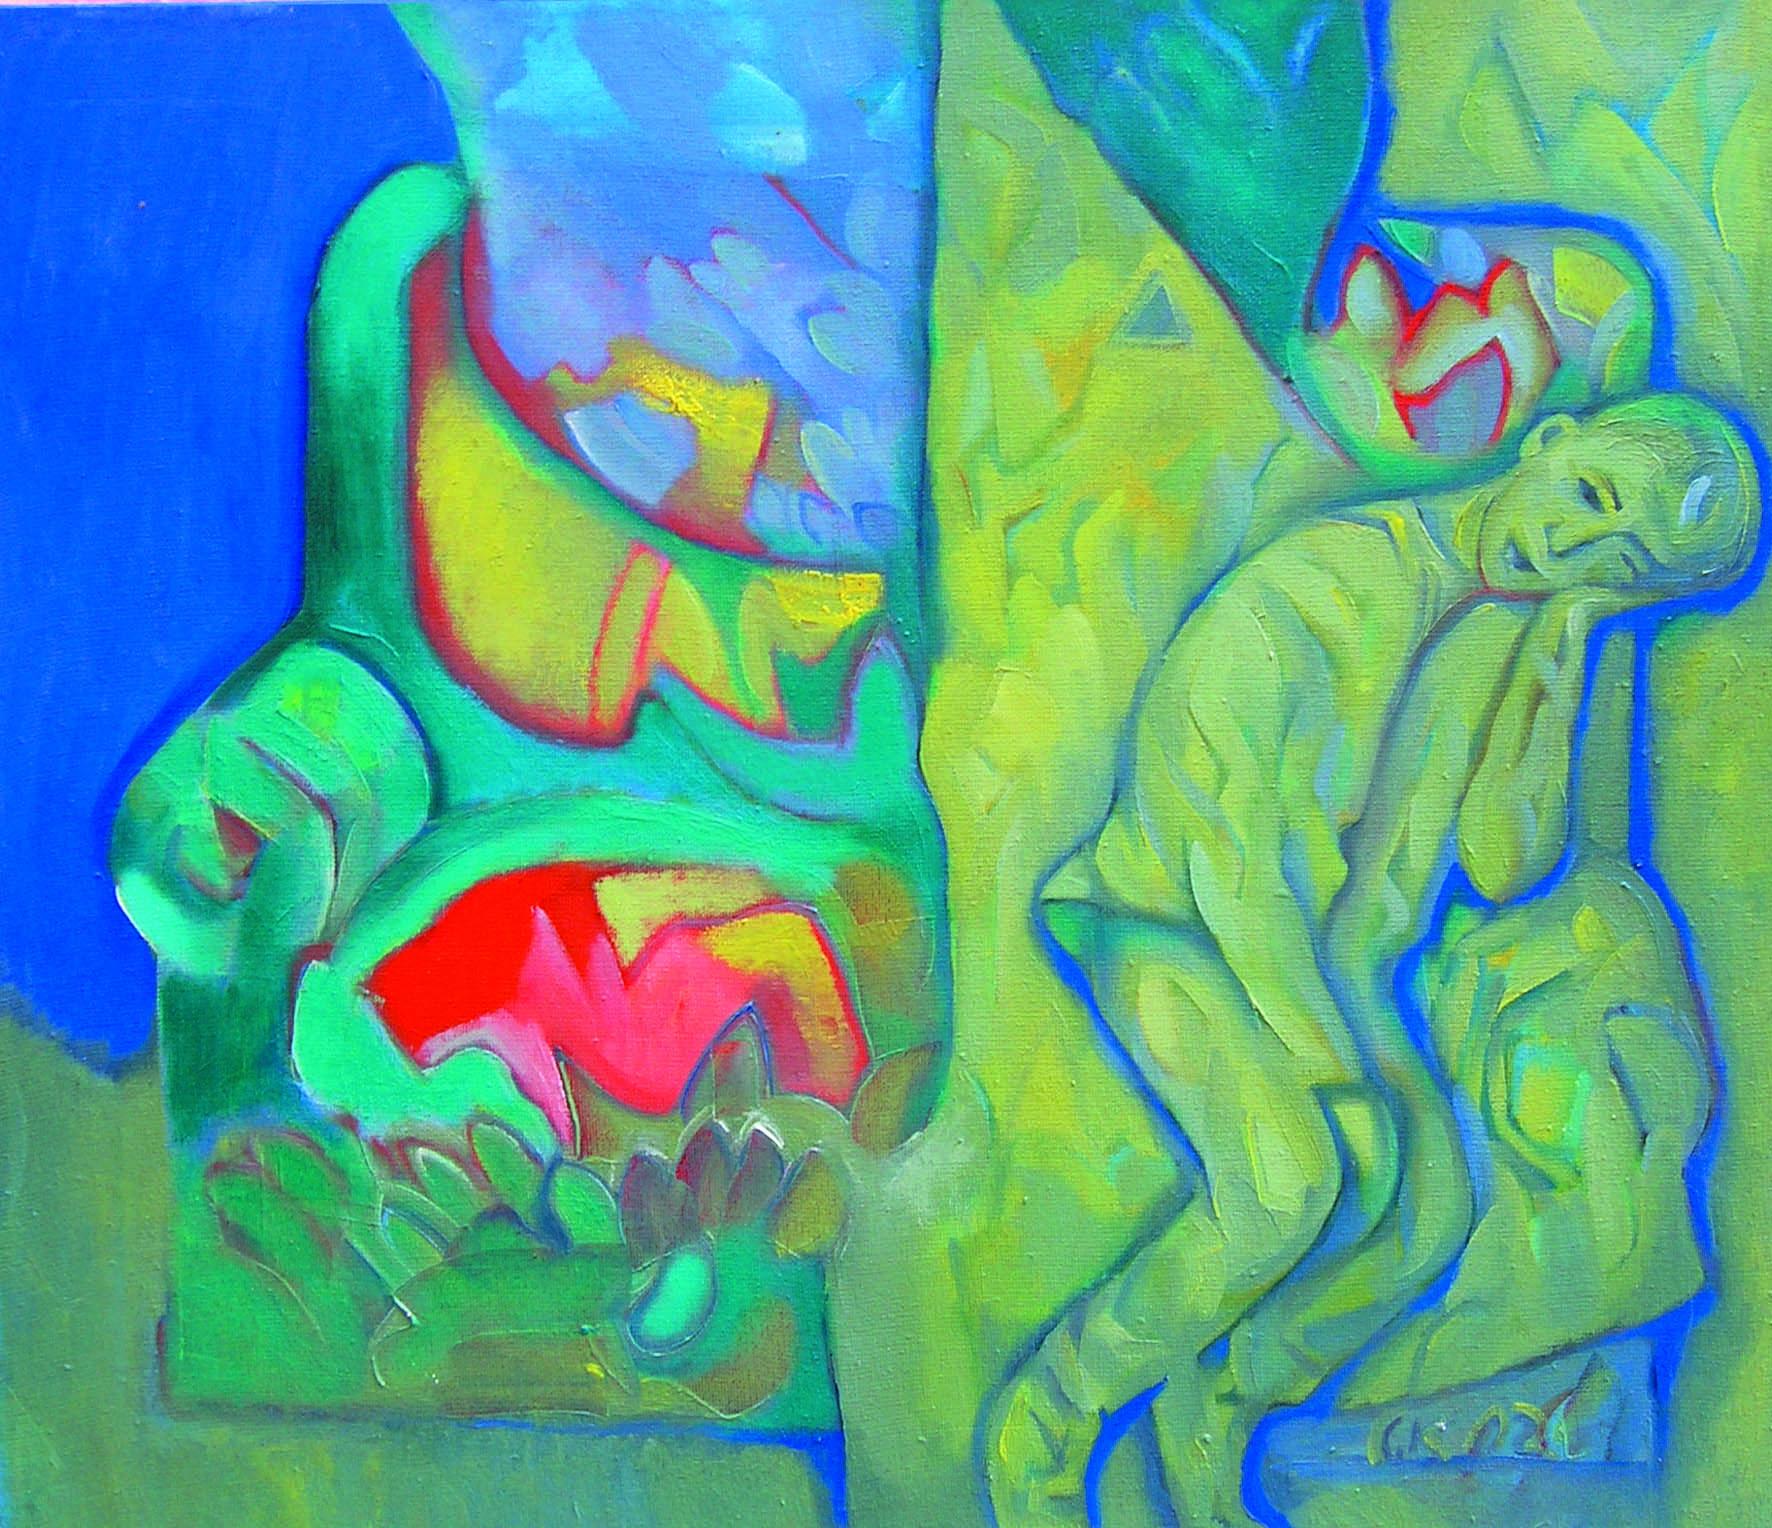 Мальчик на диване.     2002 г.      Холст, масло.     52х60 см.